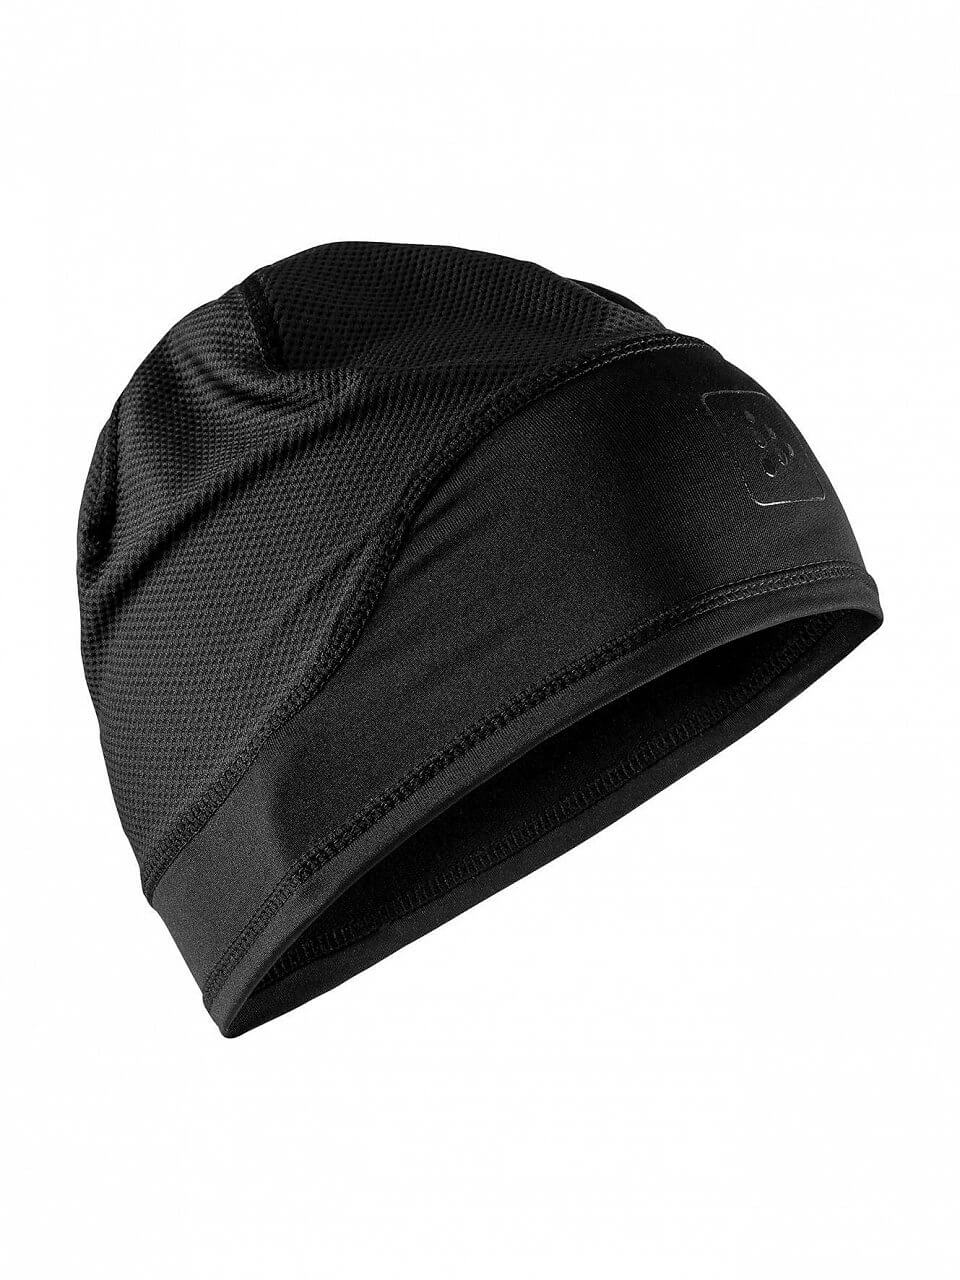 Craft Čepice Drill Mesh černá  928d90234f